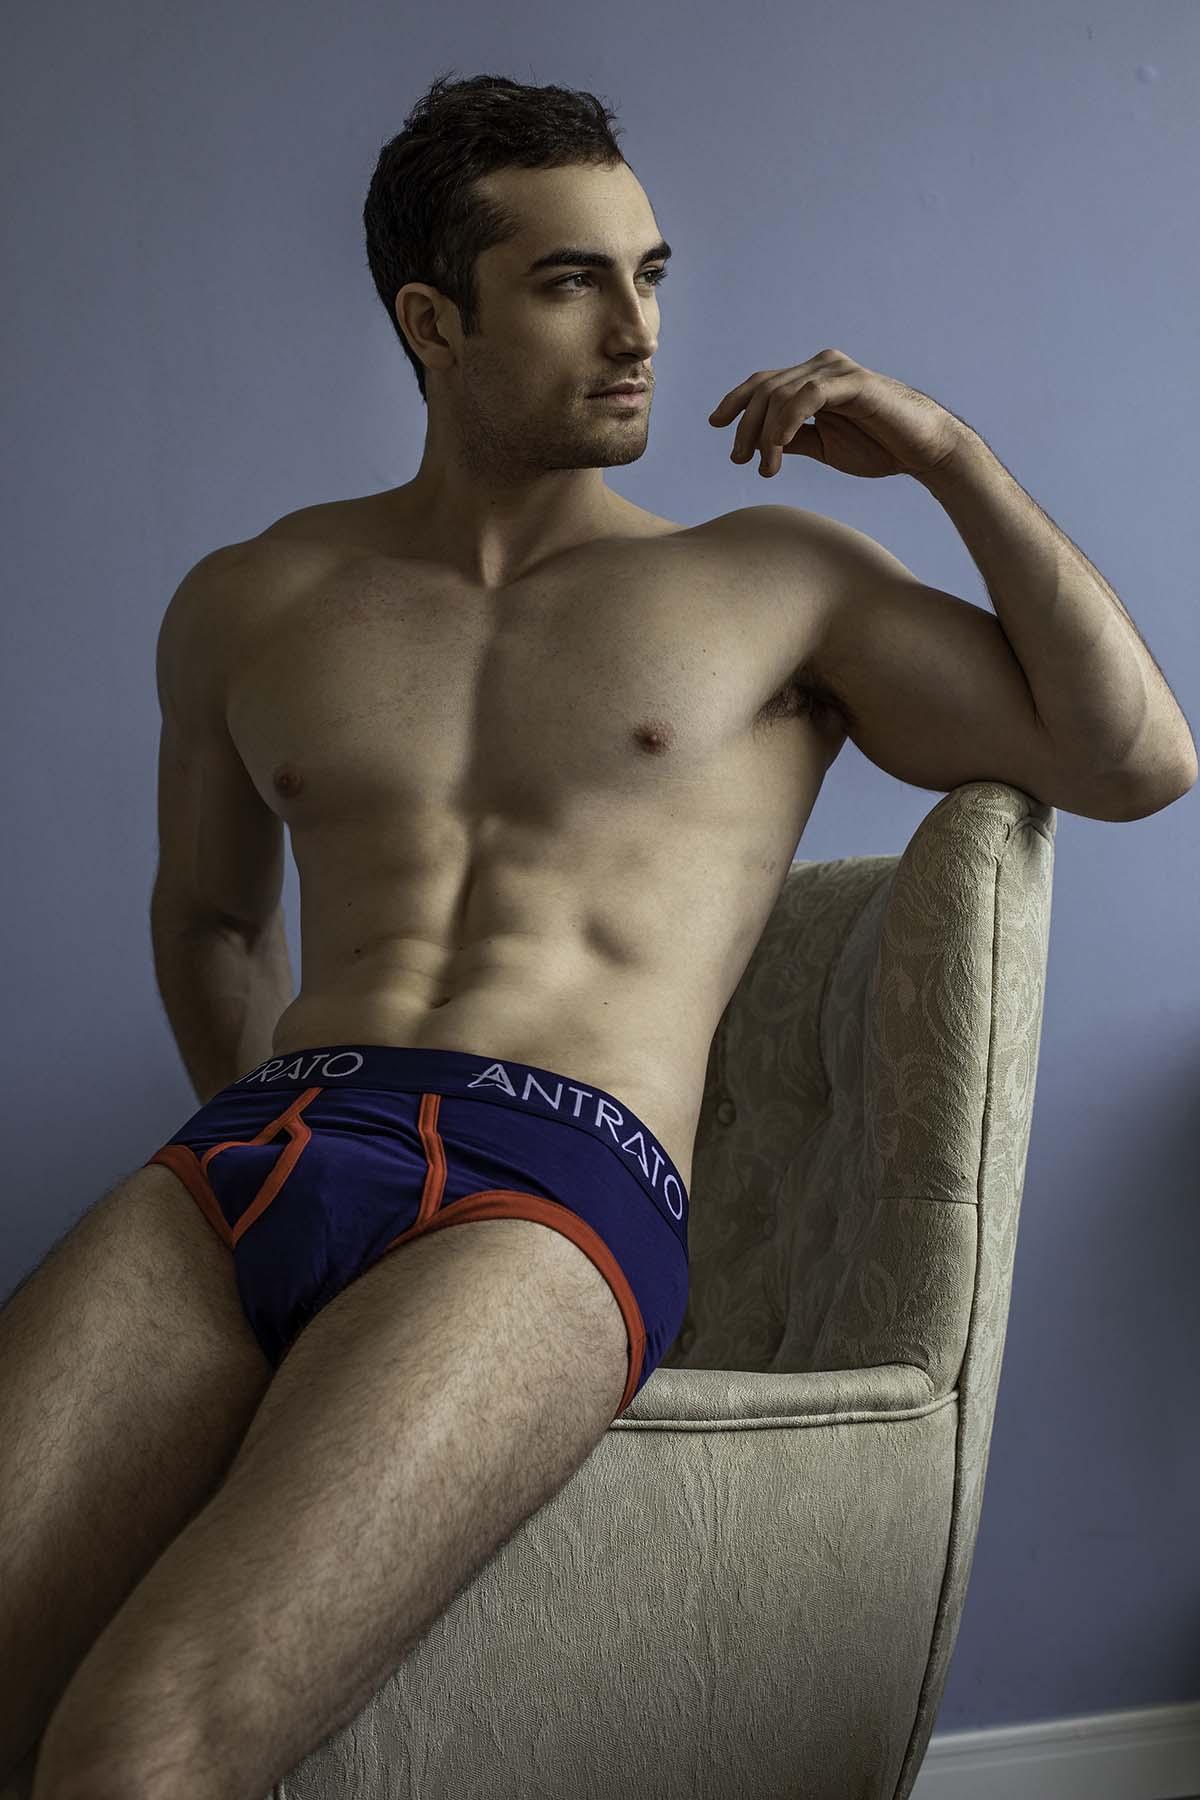 Arthur Branco by Ronaldo Gutierrez with Antrato for Brazilian Male Model